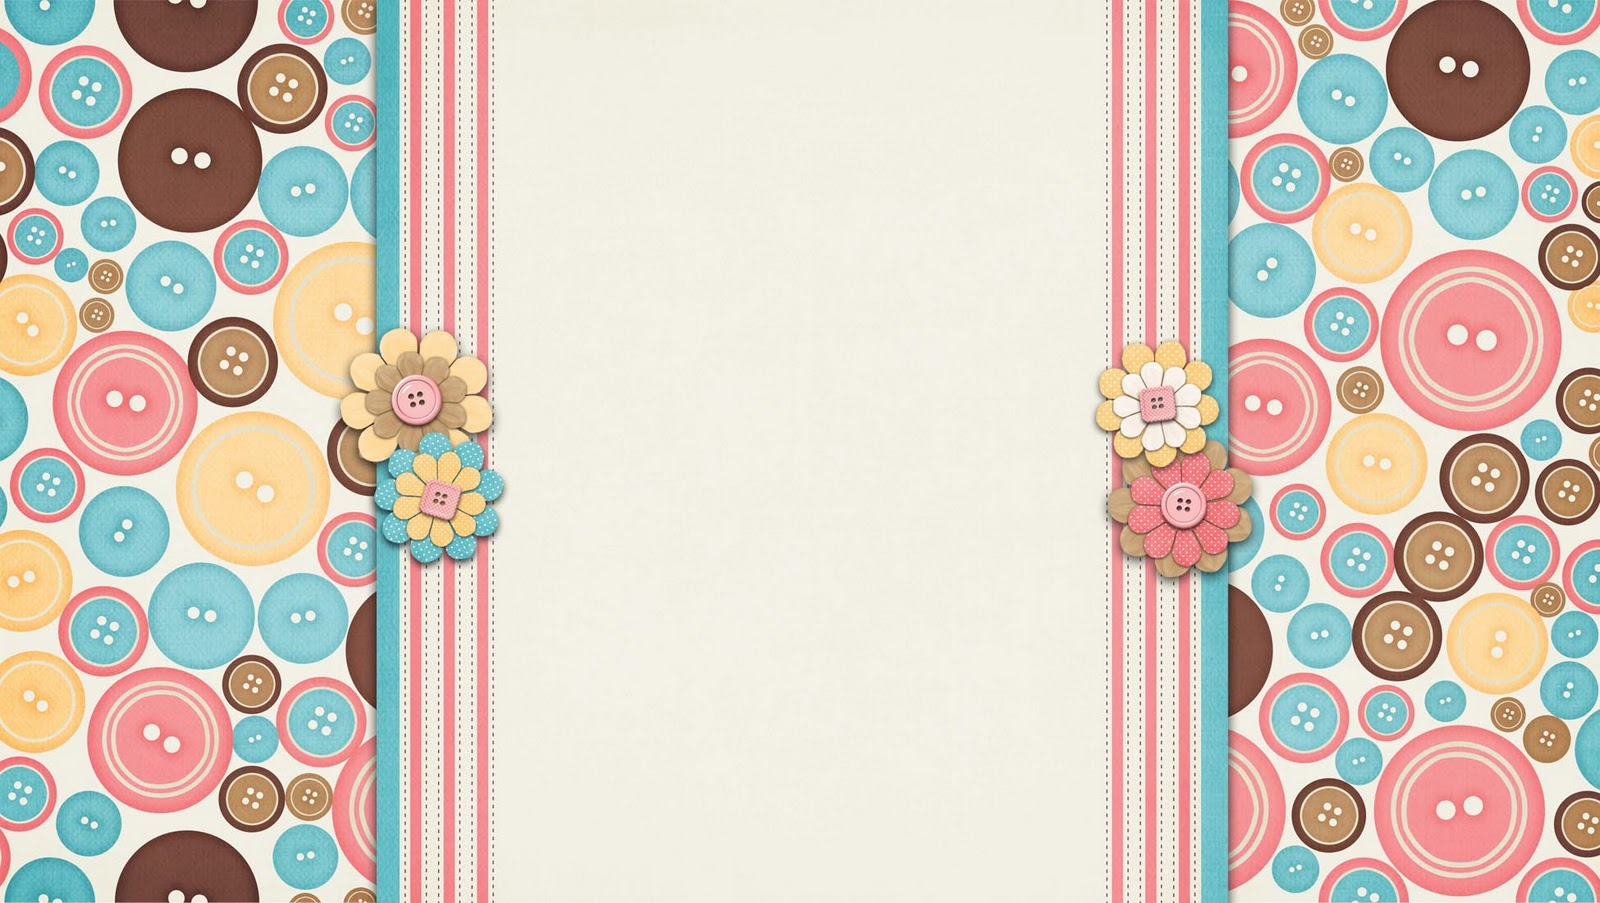 Cute Wallpaper Backgrounds